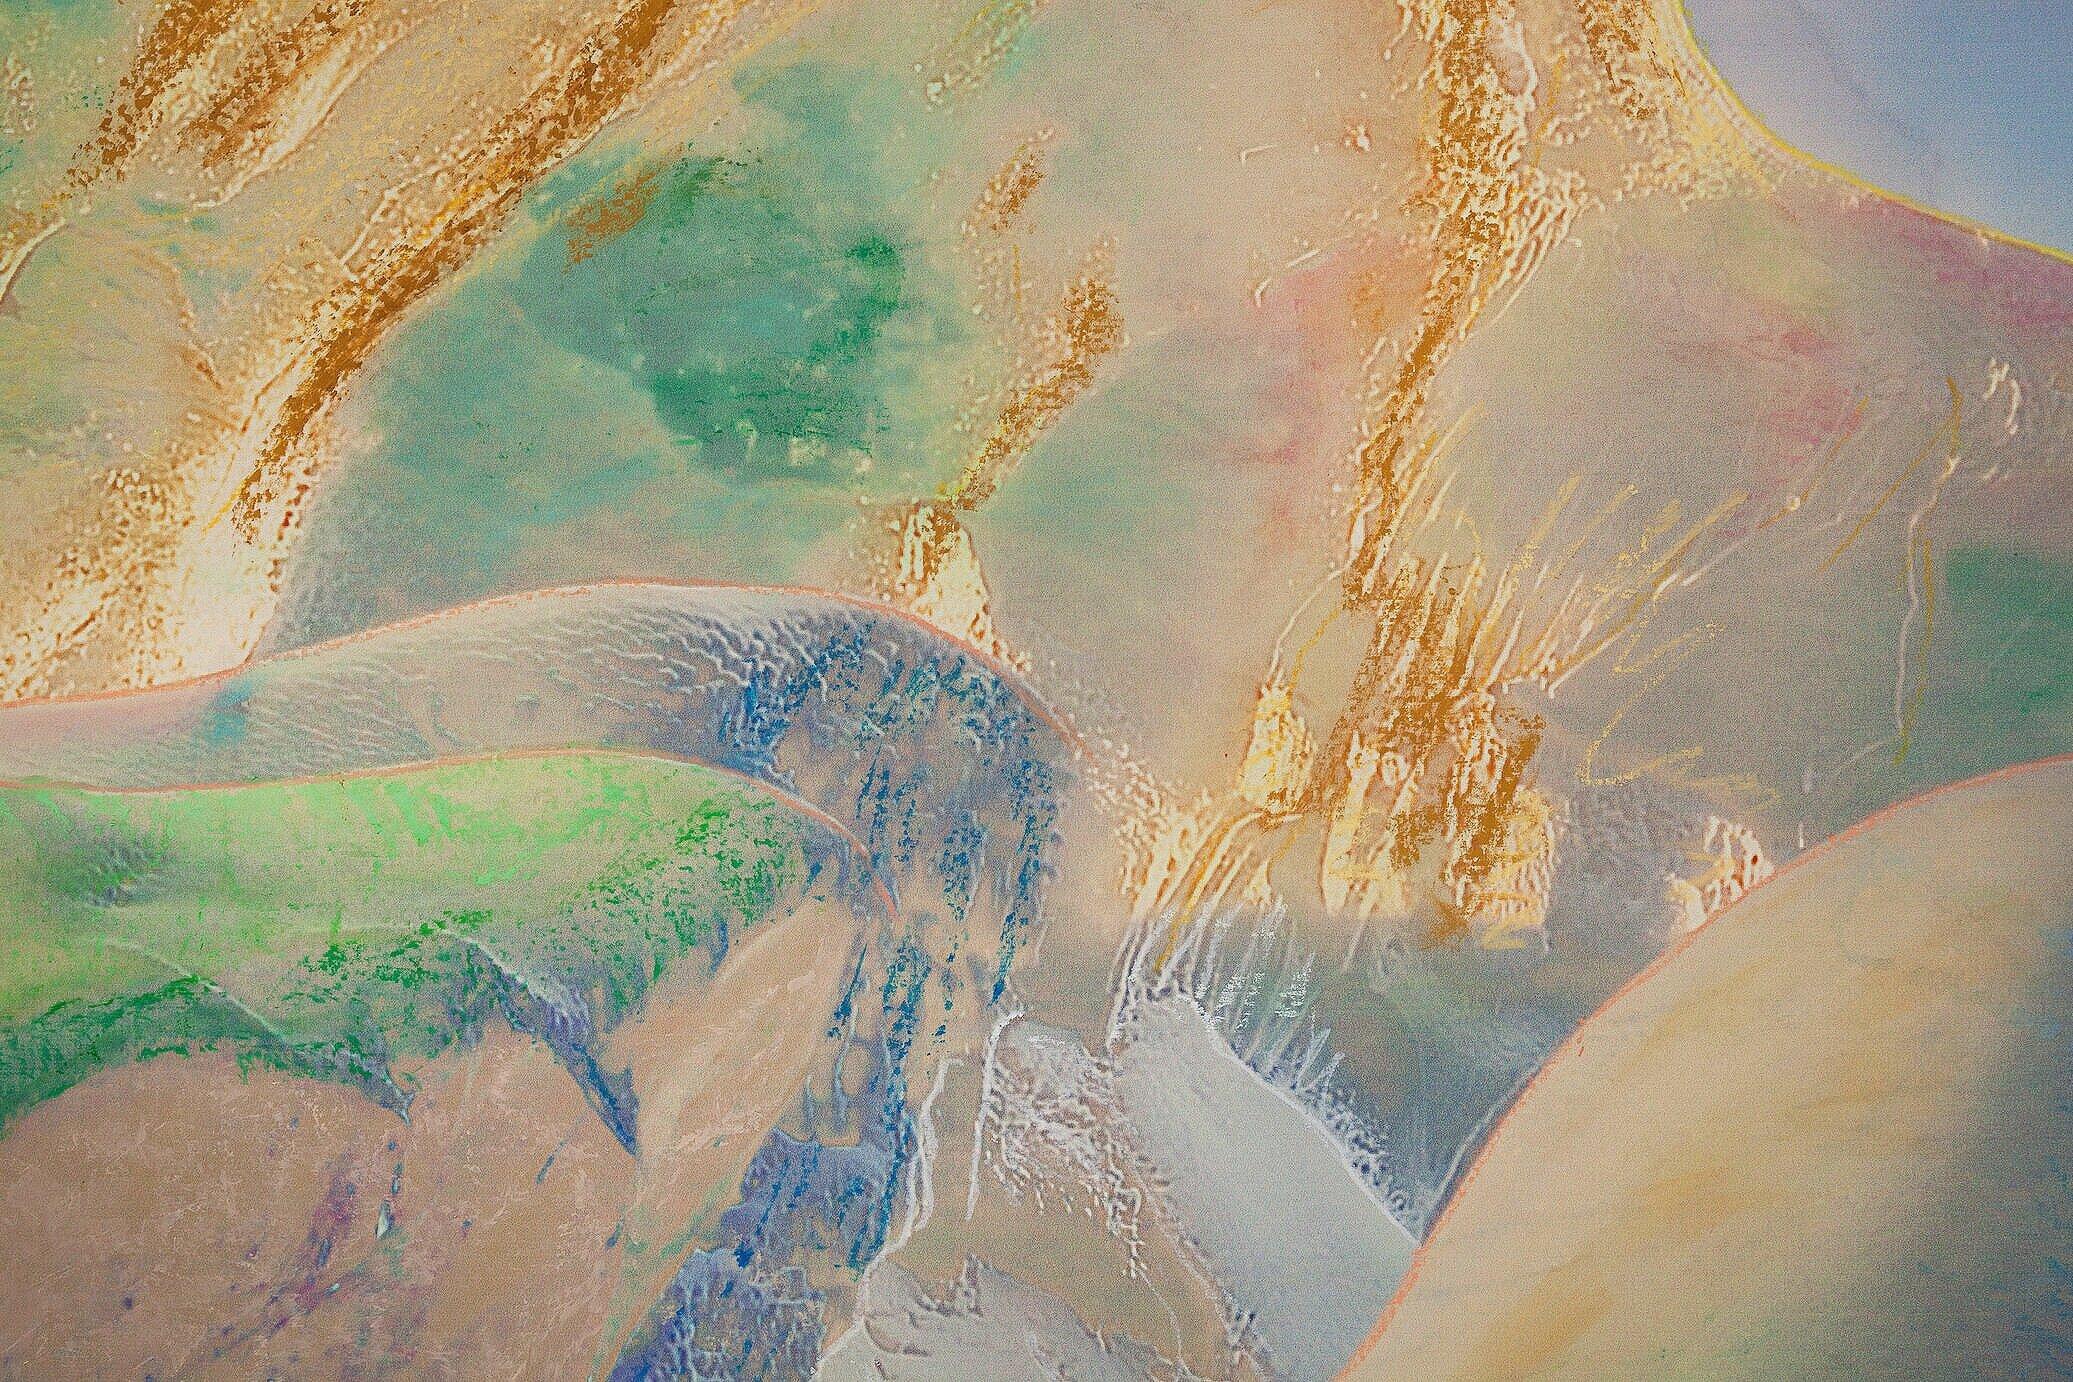 Beyond the Oecumene / Part XLI (Diptych),  2019 - Detail Wax pastels, UV-print on gold Alu-Dibond